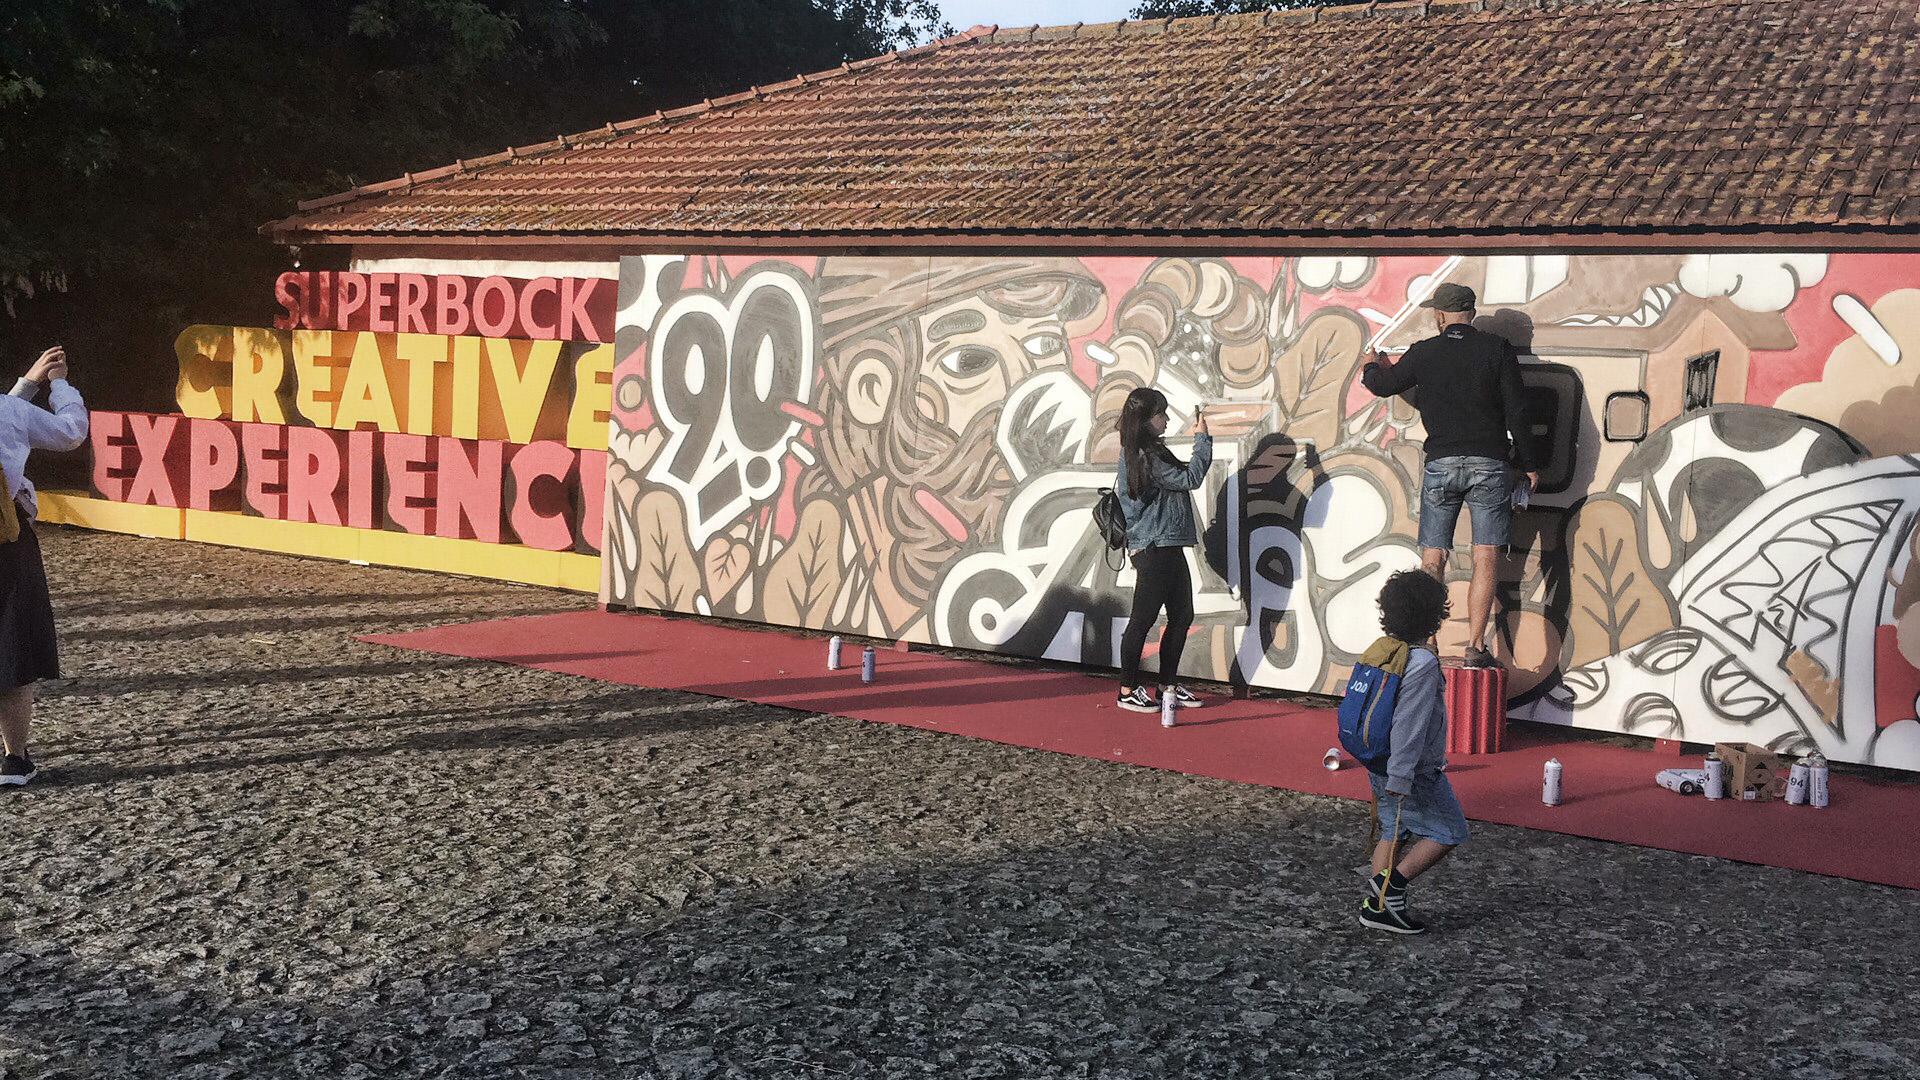 Super Bock - Creative Experience